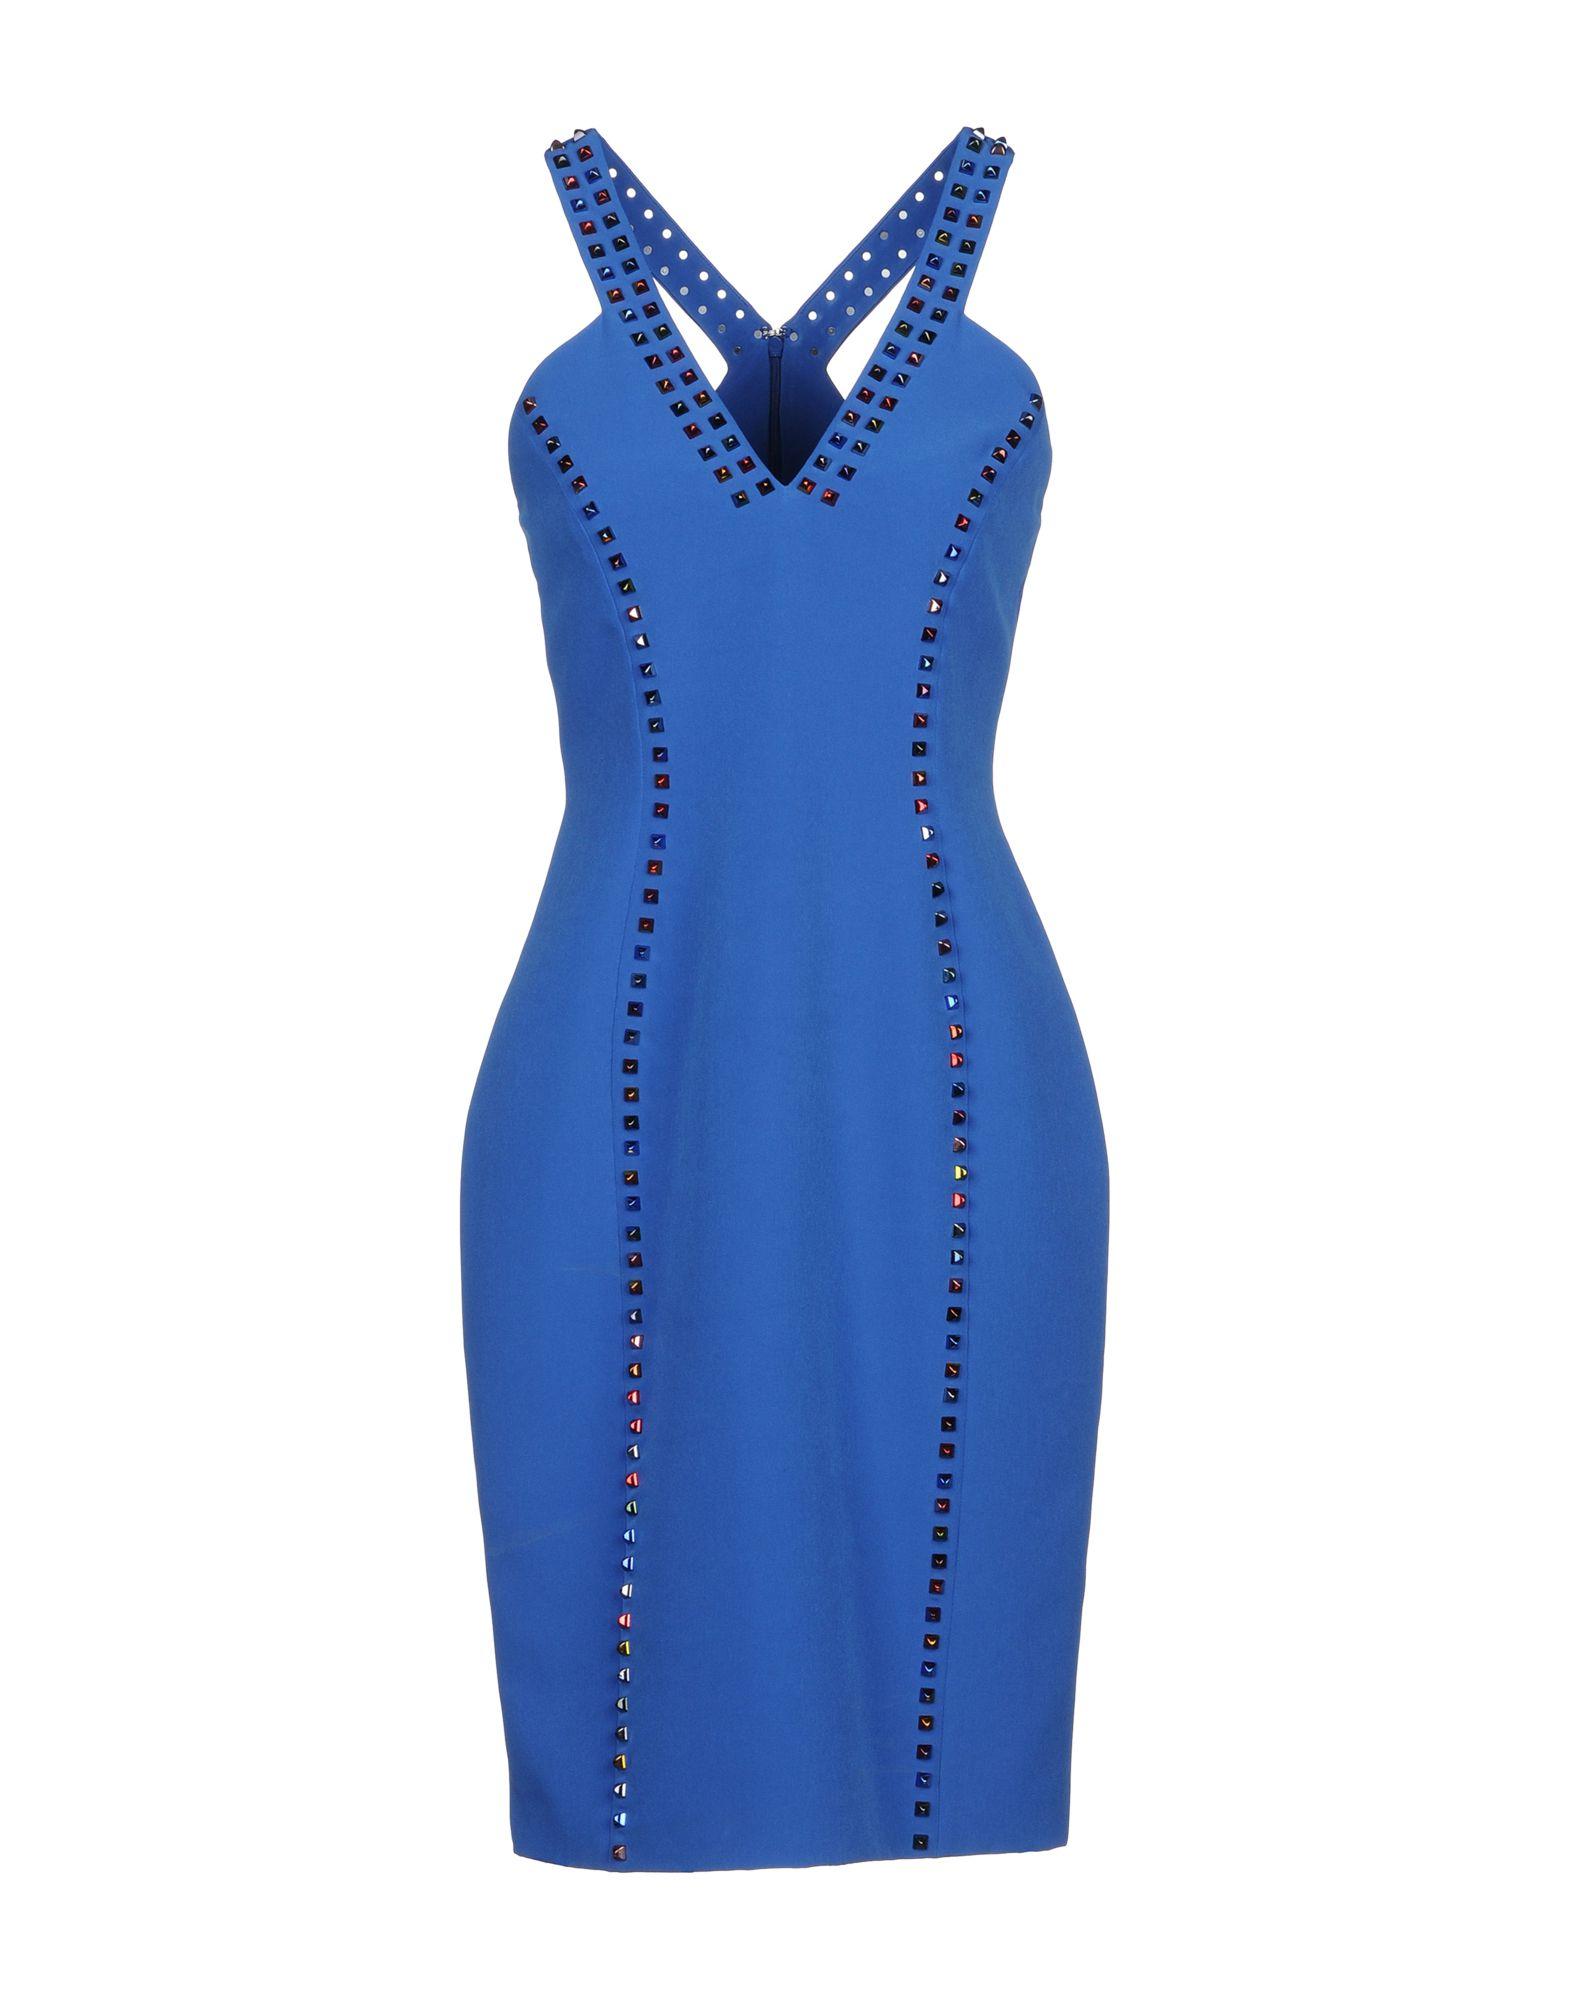 aaf4ab9e6cf versace shop for women - women s versace catalogue - Cools.com